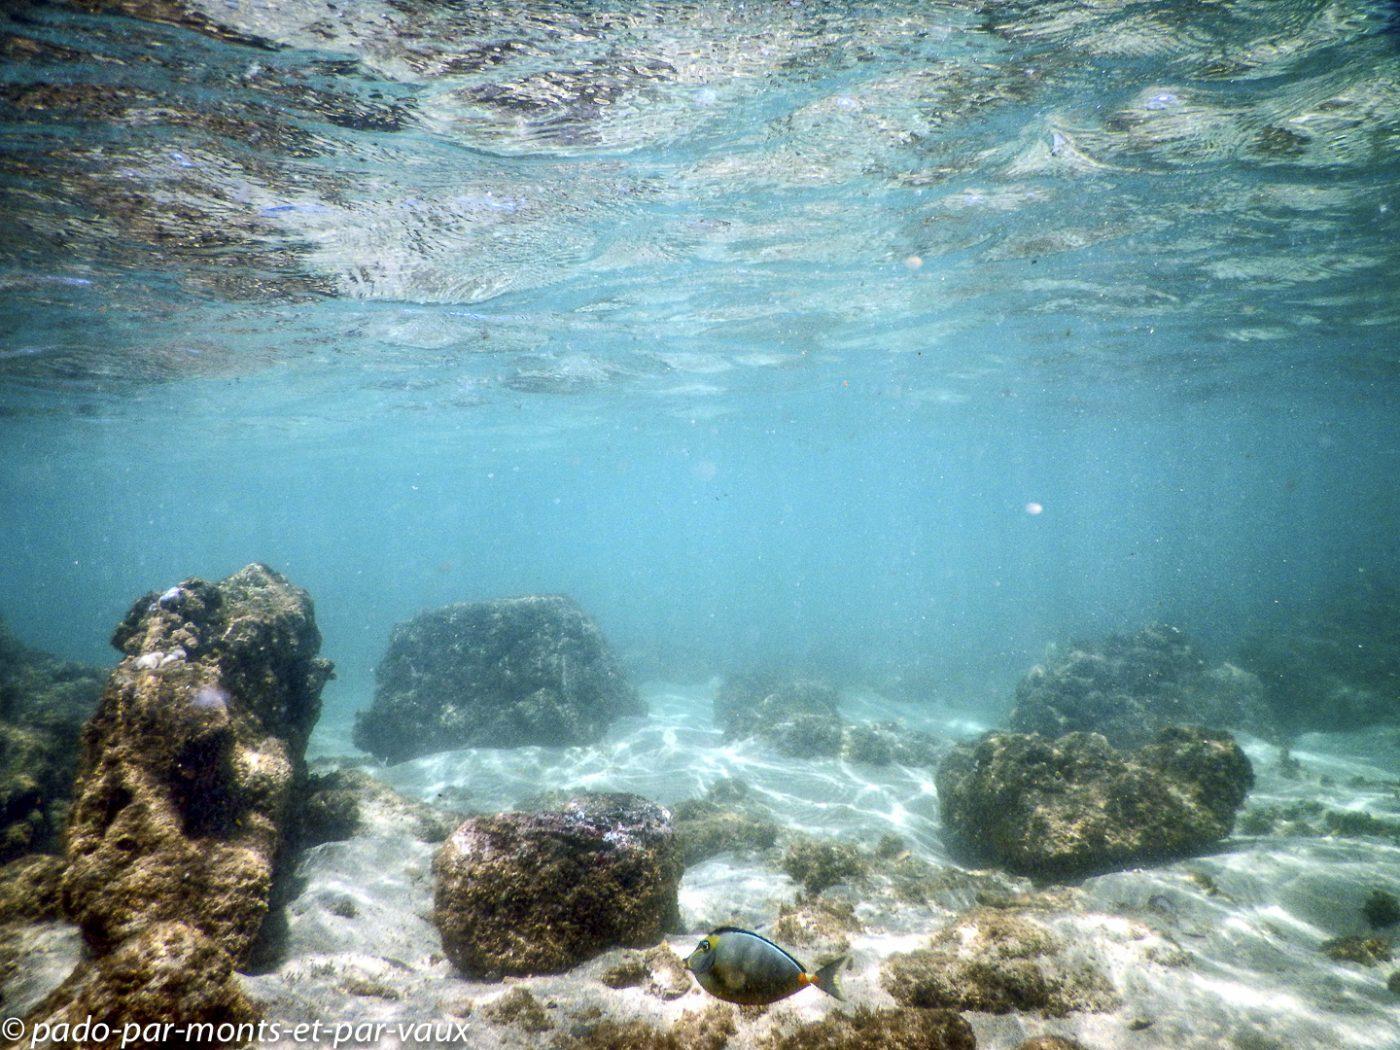 Kauai - Salt pond beach park - Nason à éperons orange